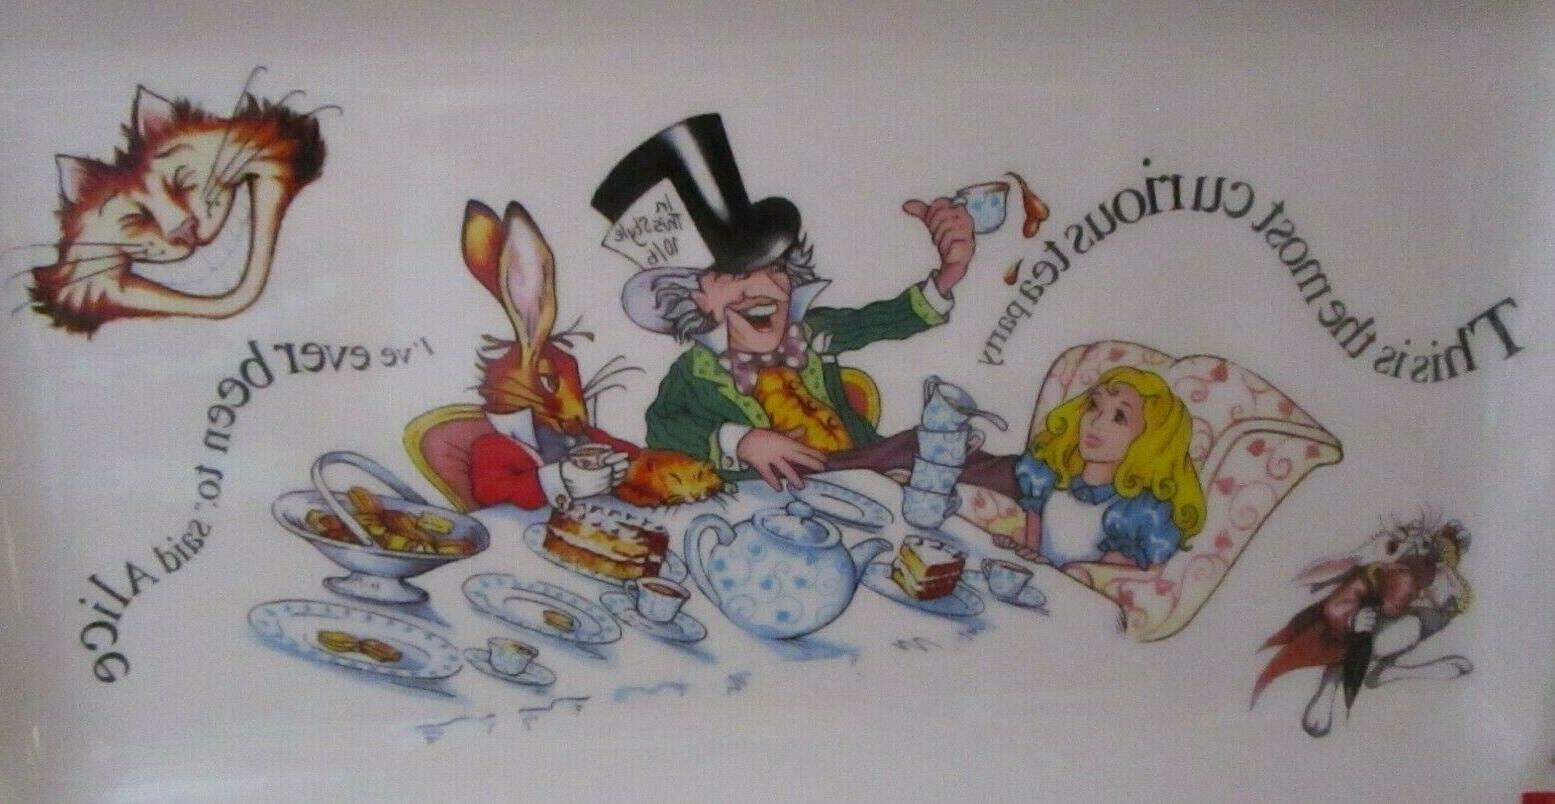 Alice Hatter's Rectangular by Cardew